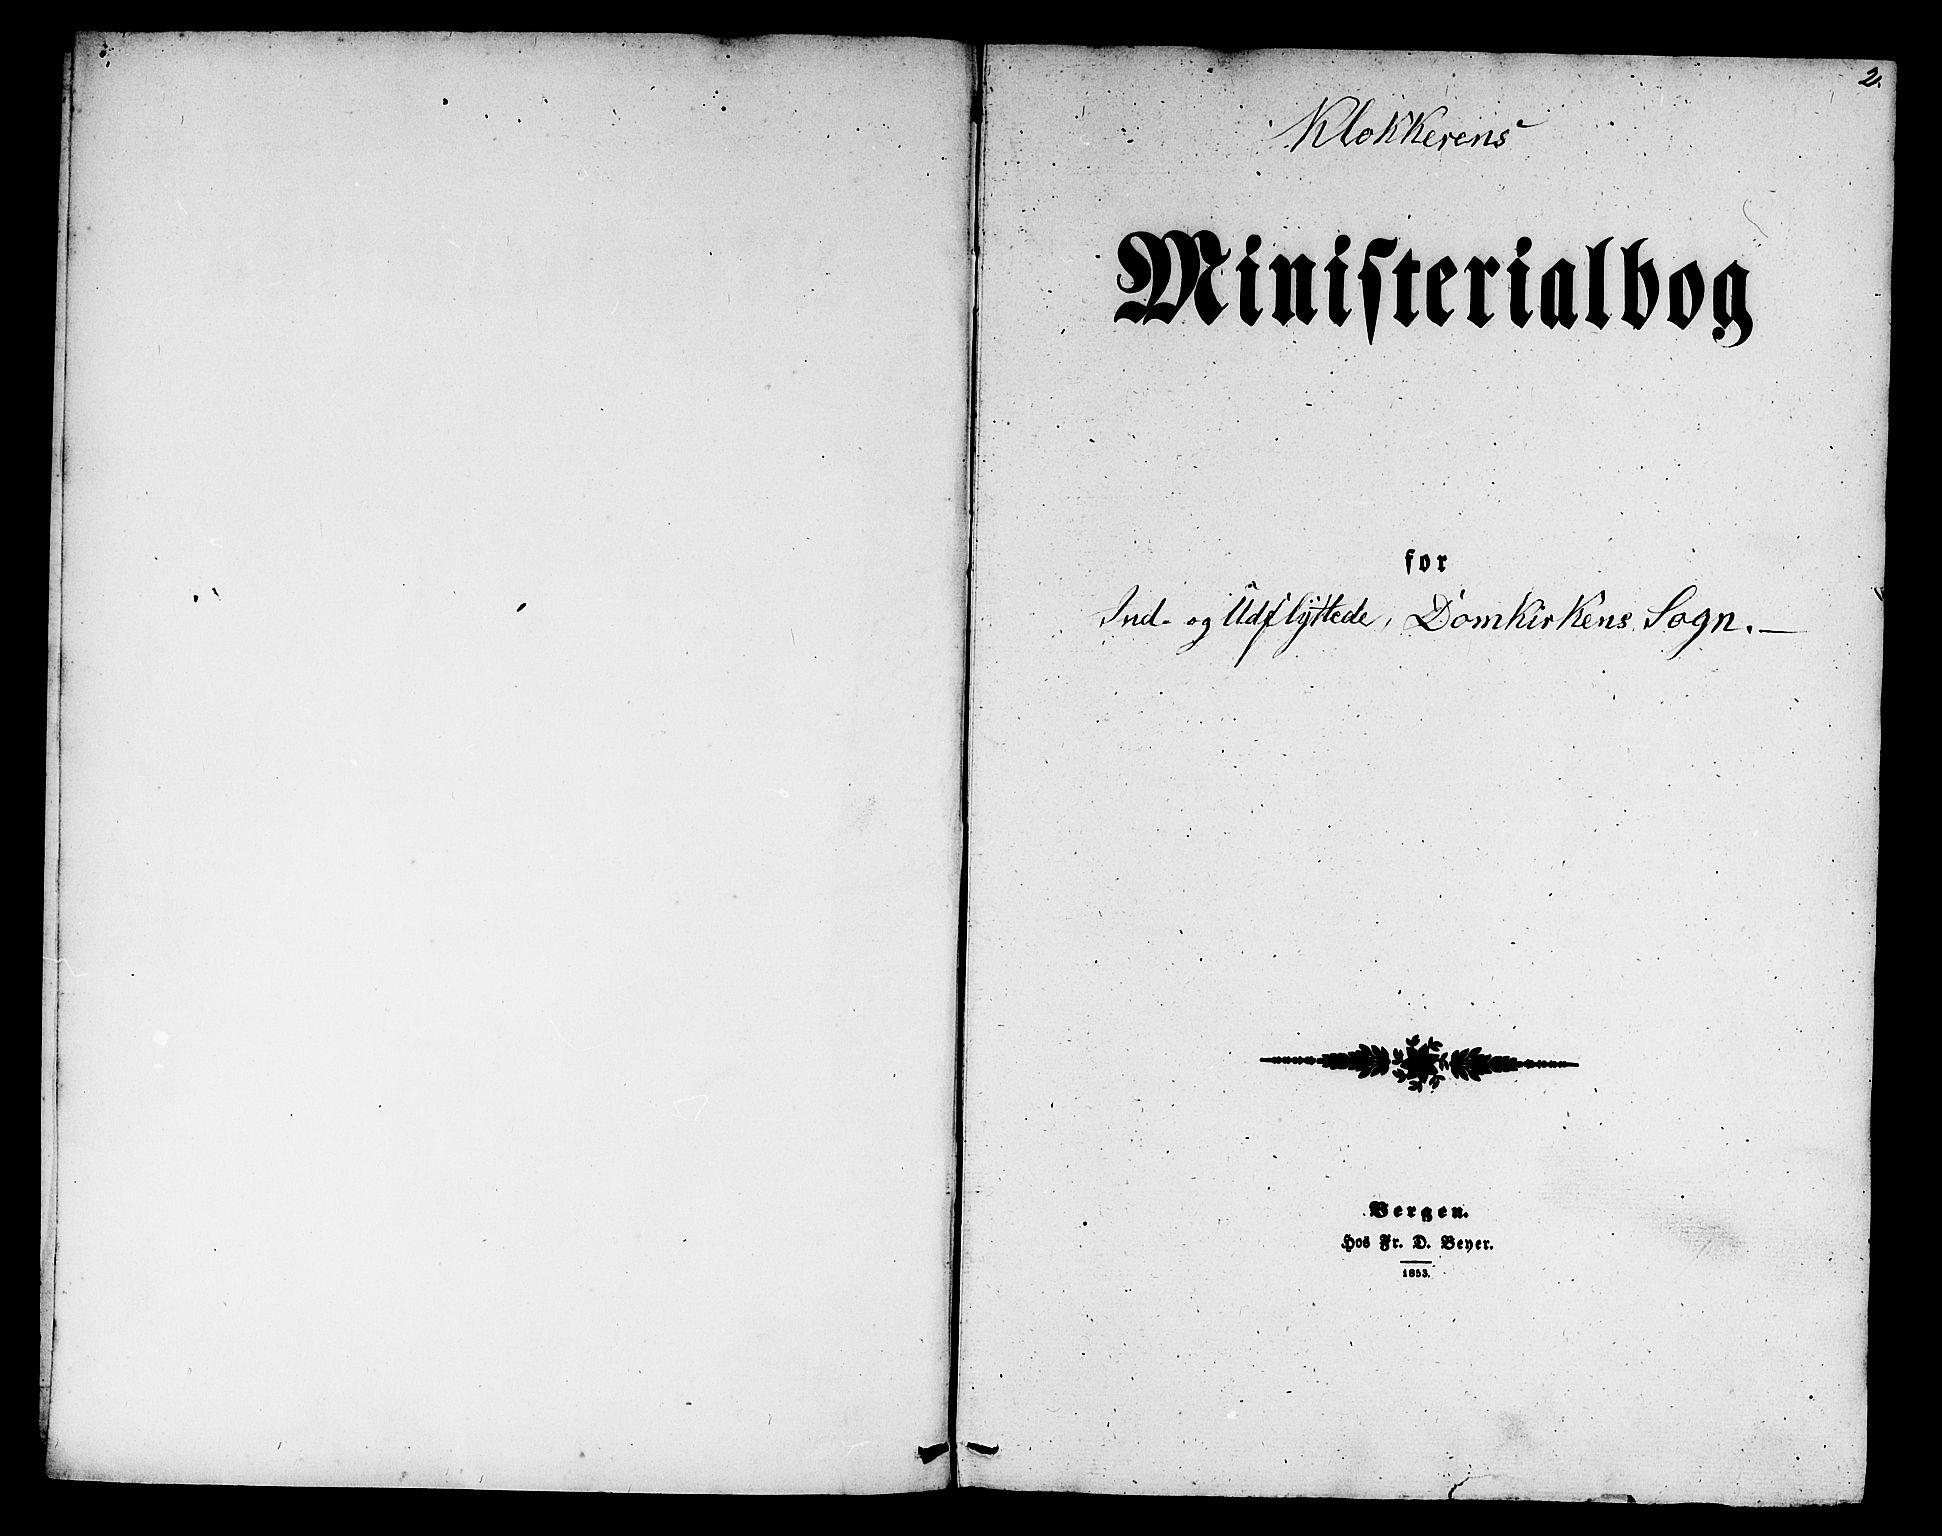 SAB, Domkirken Sokneprestembete, H/Hab/L0044: Klokkerbok nr. F 1, 1856-1879, s. 2